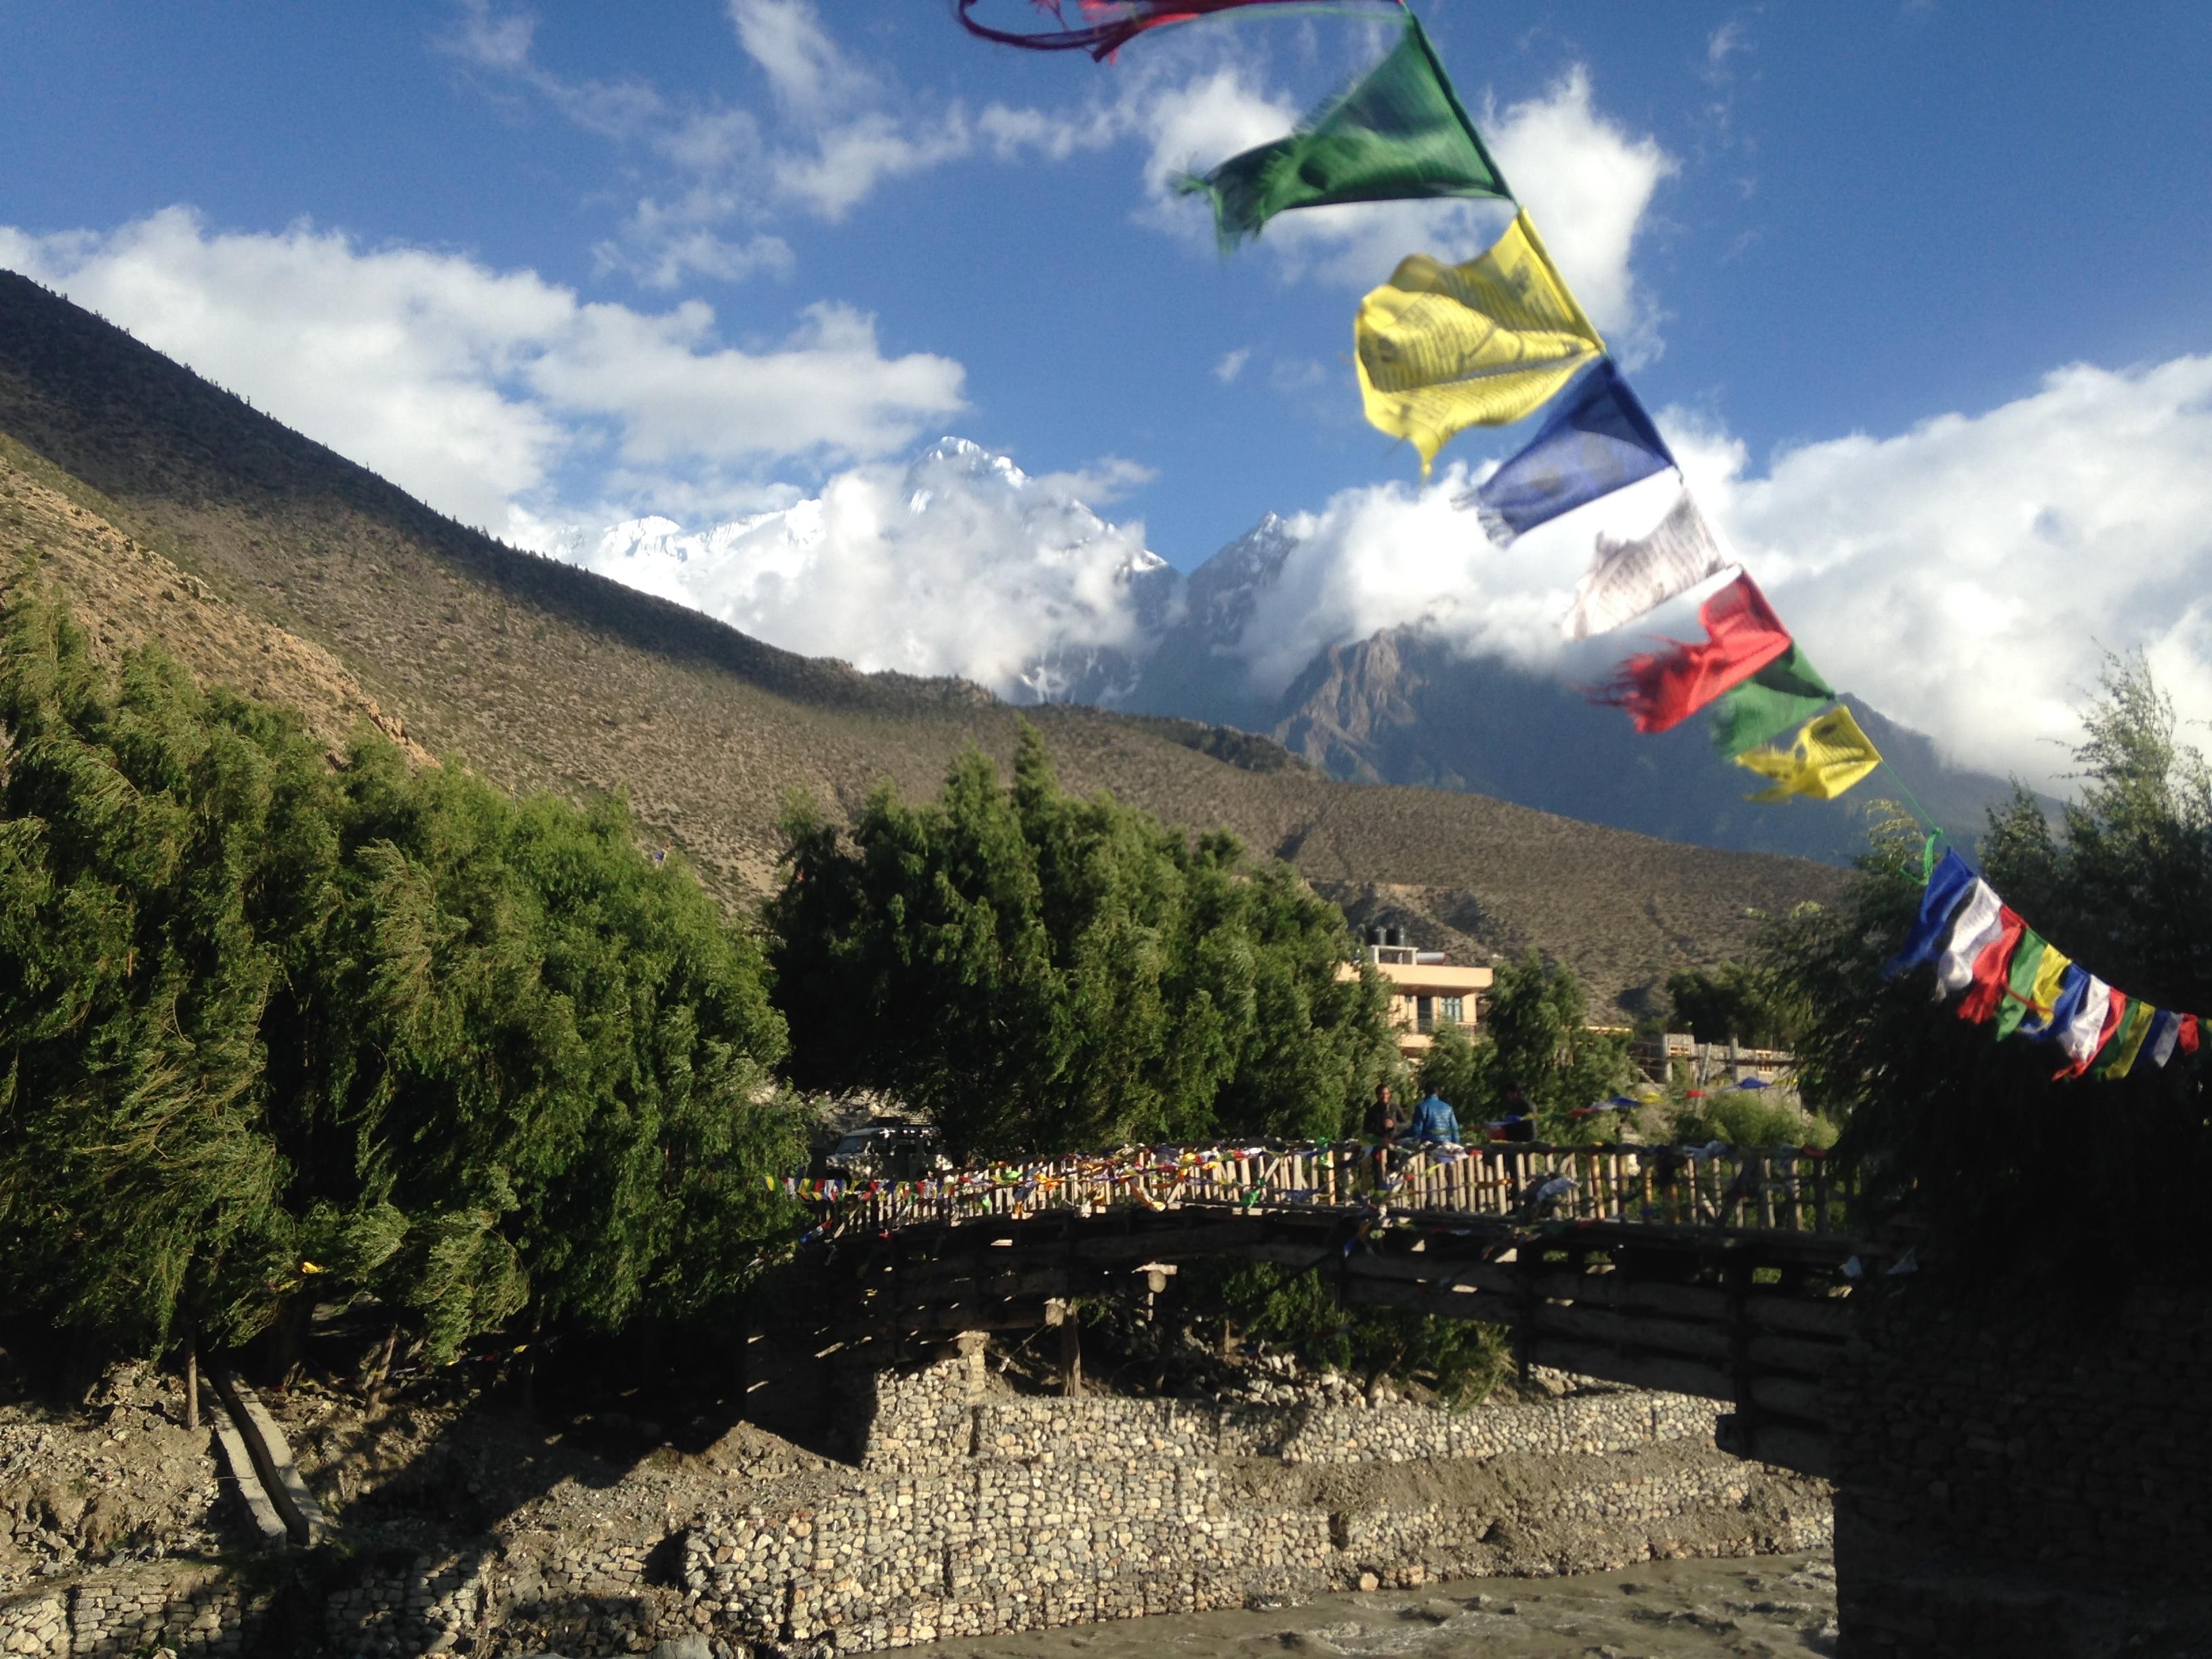 Jomsom Village - Annapurna circuit trek 10 days